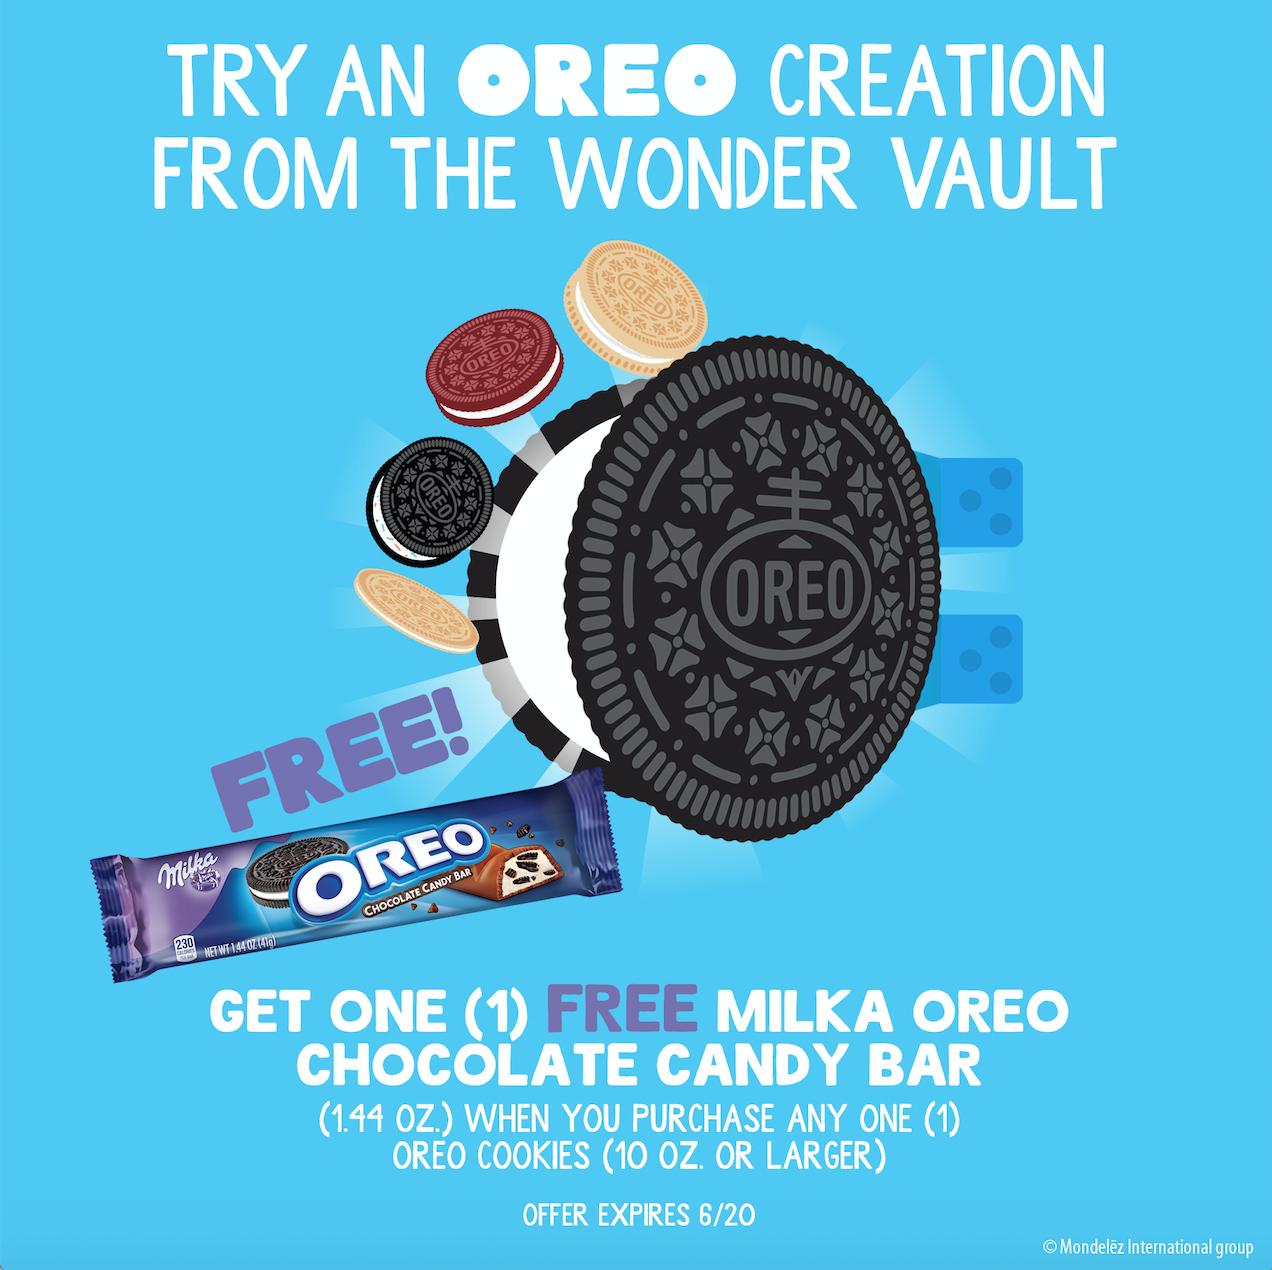 OREO Wonder Vault Promo image